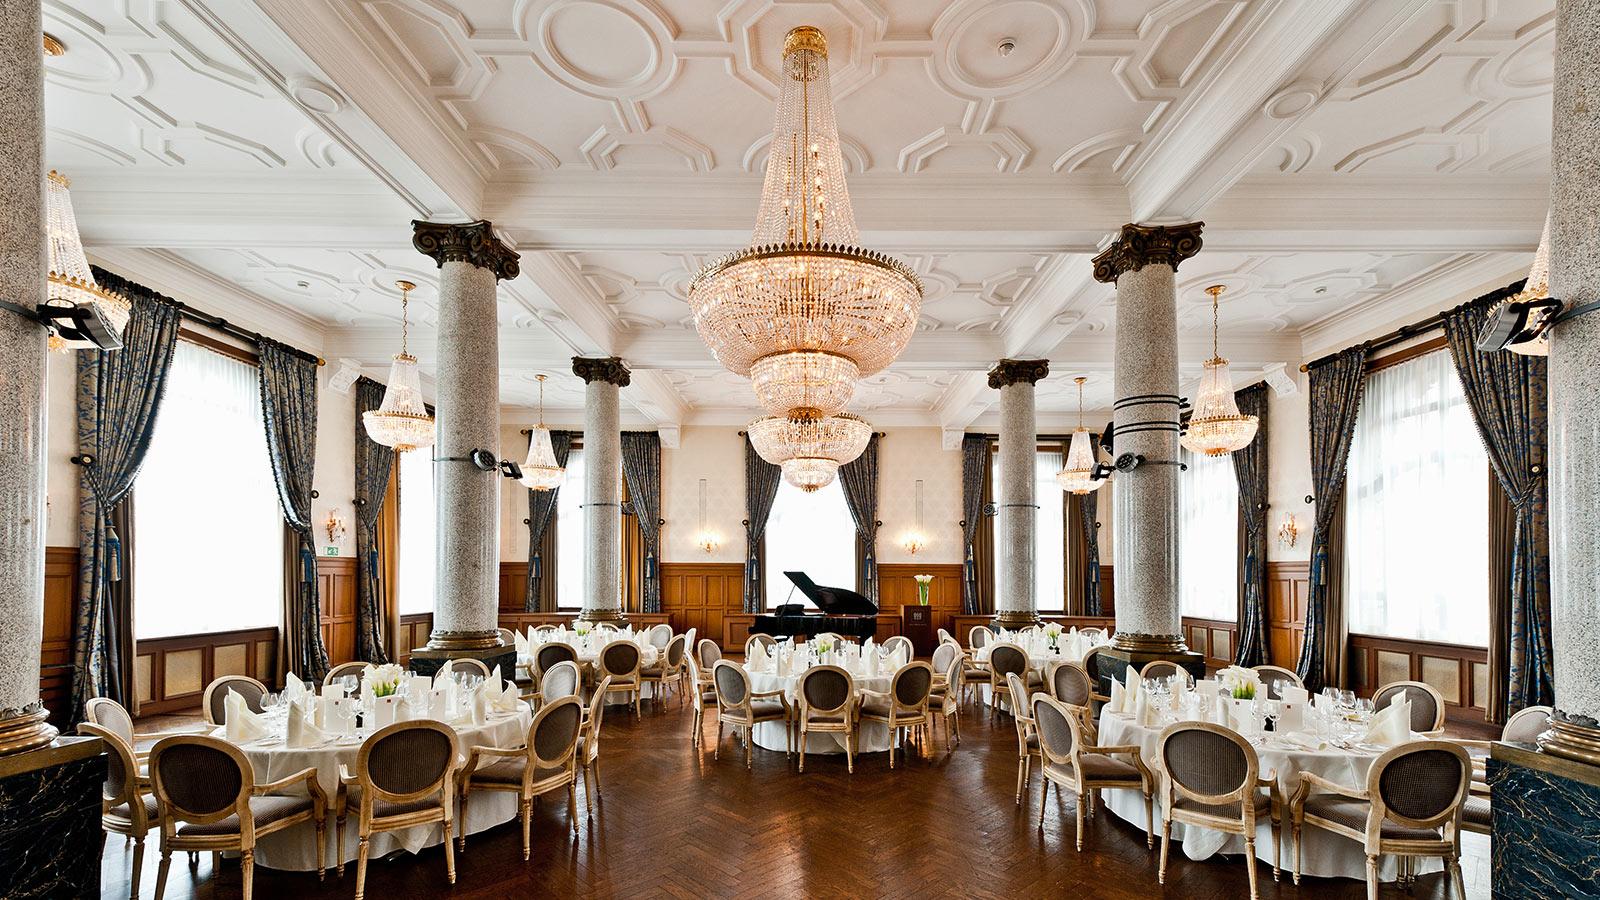 Salle belle epoque grand hotel les trois rois basel for Salle de bain belle epoque